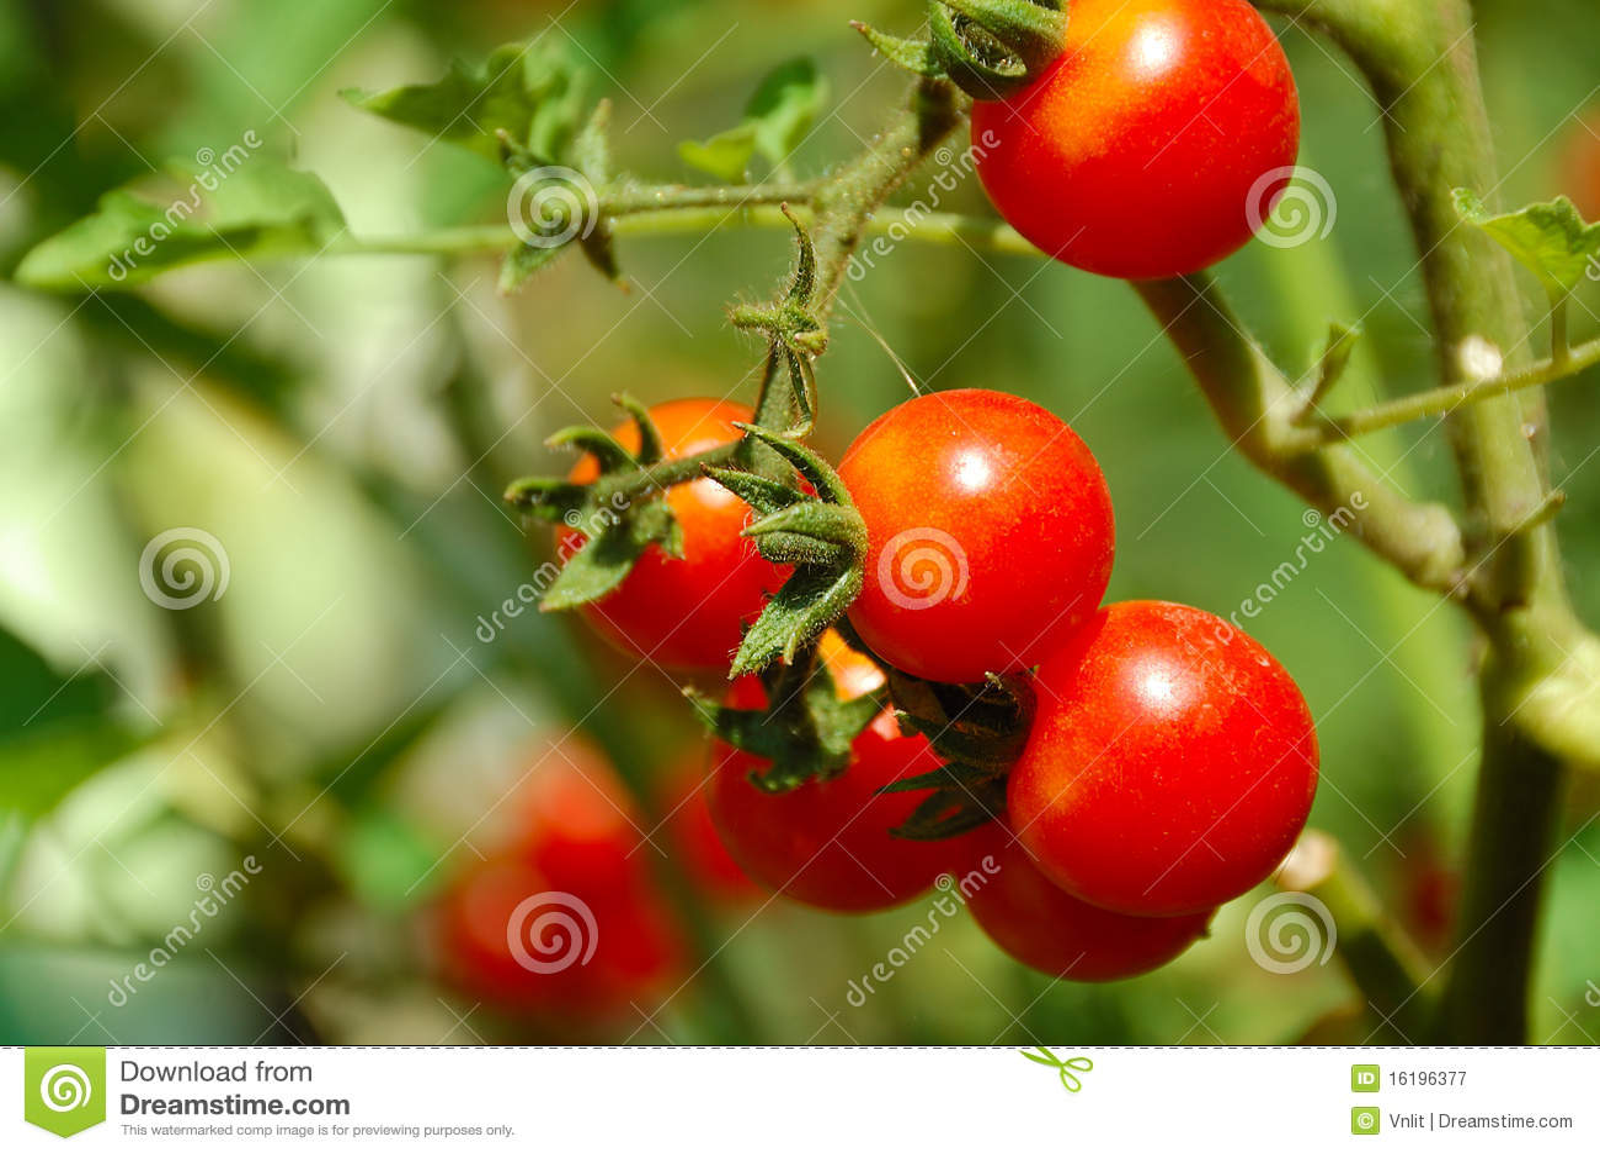 Cherry tomato on bed